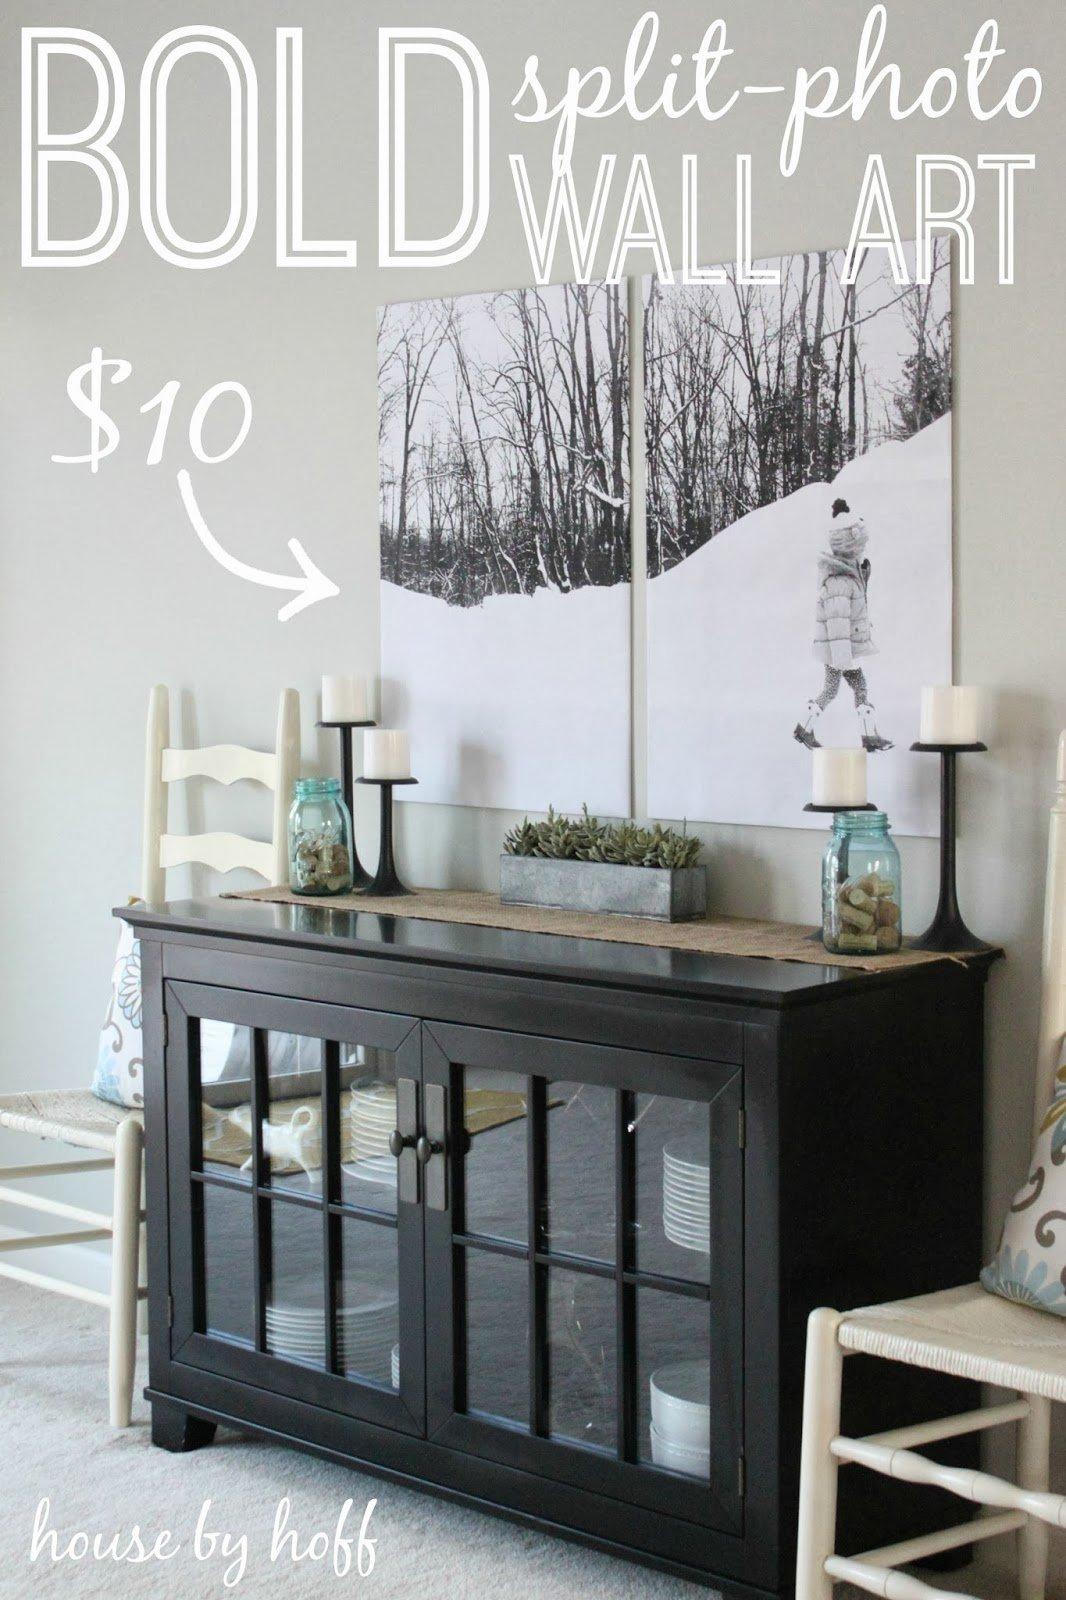 Homebase Wall Art : Beautiful and inspiring diy wall art ideas